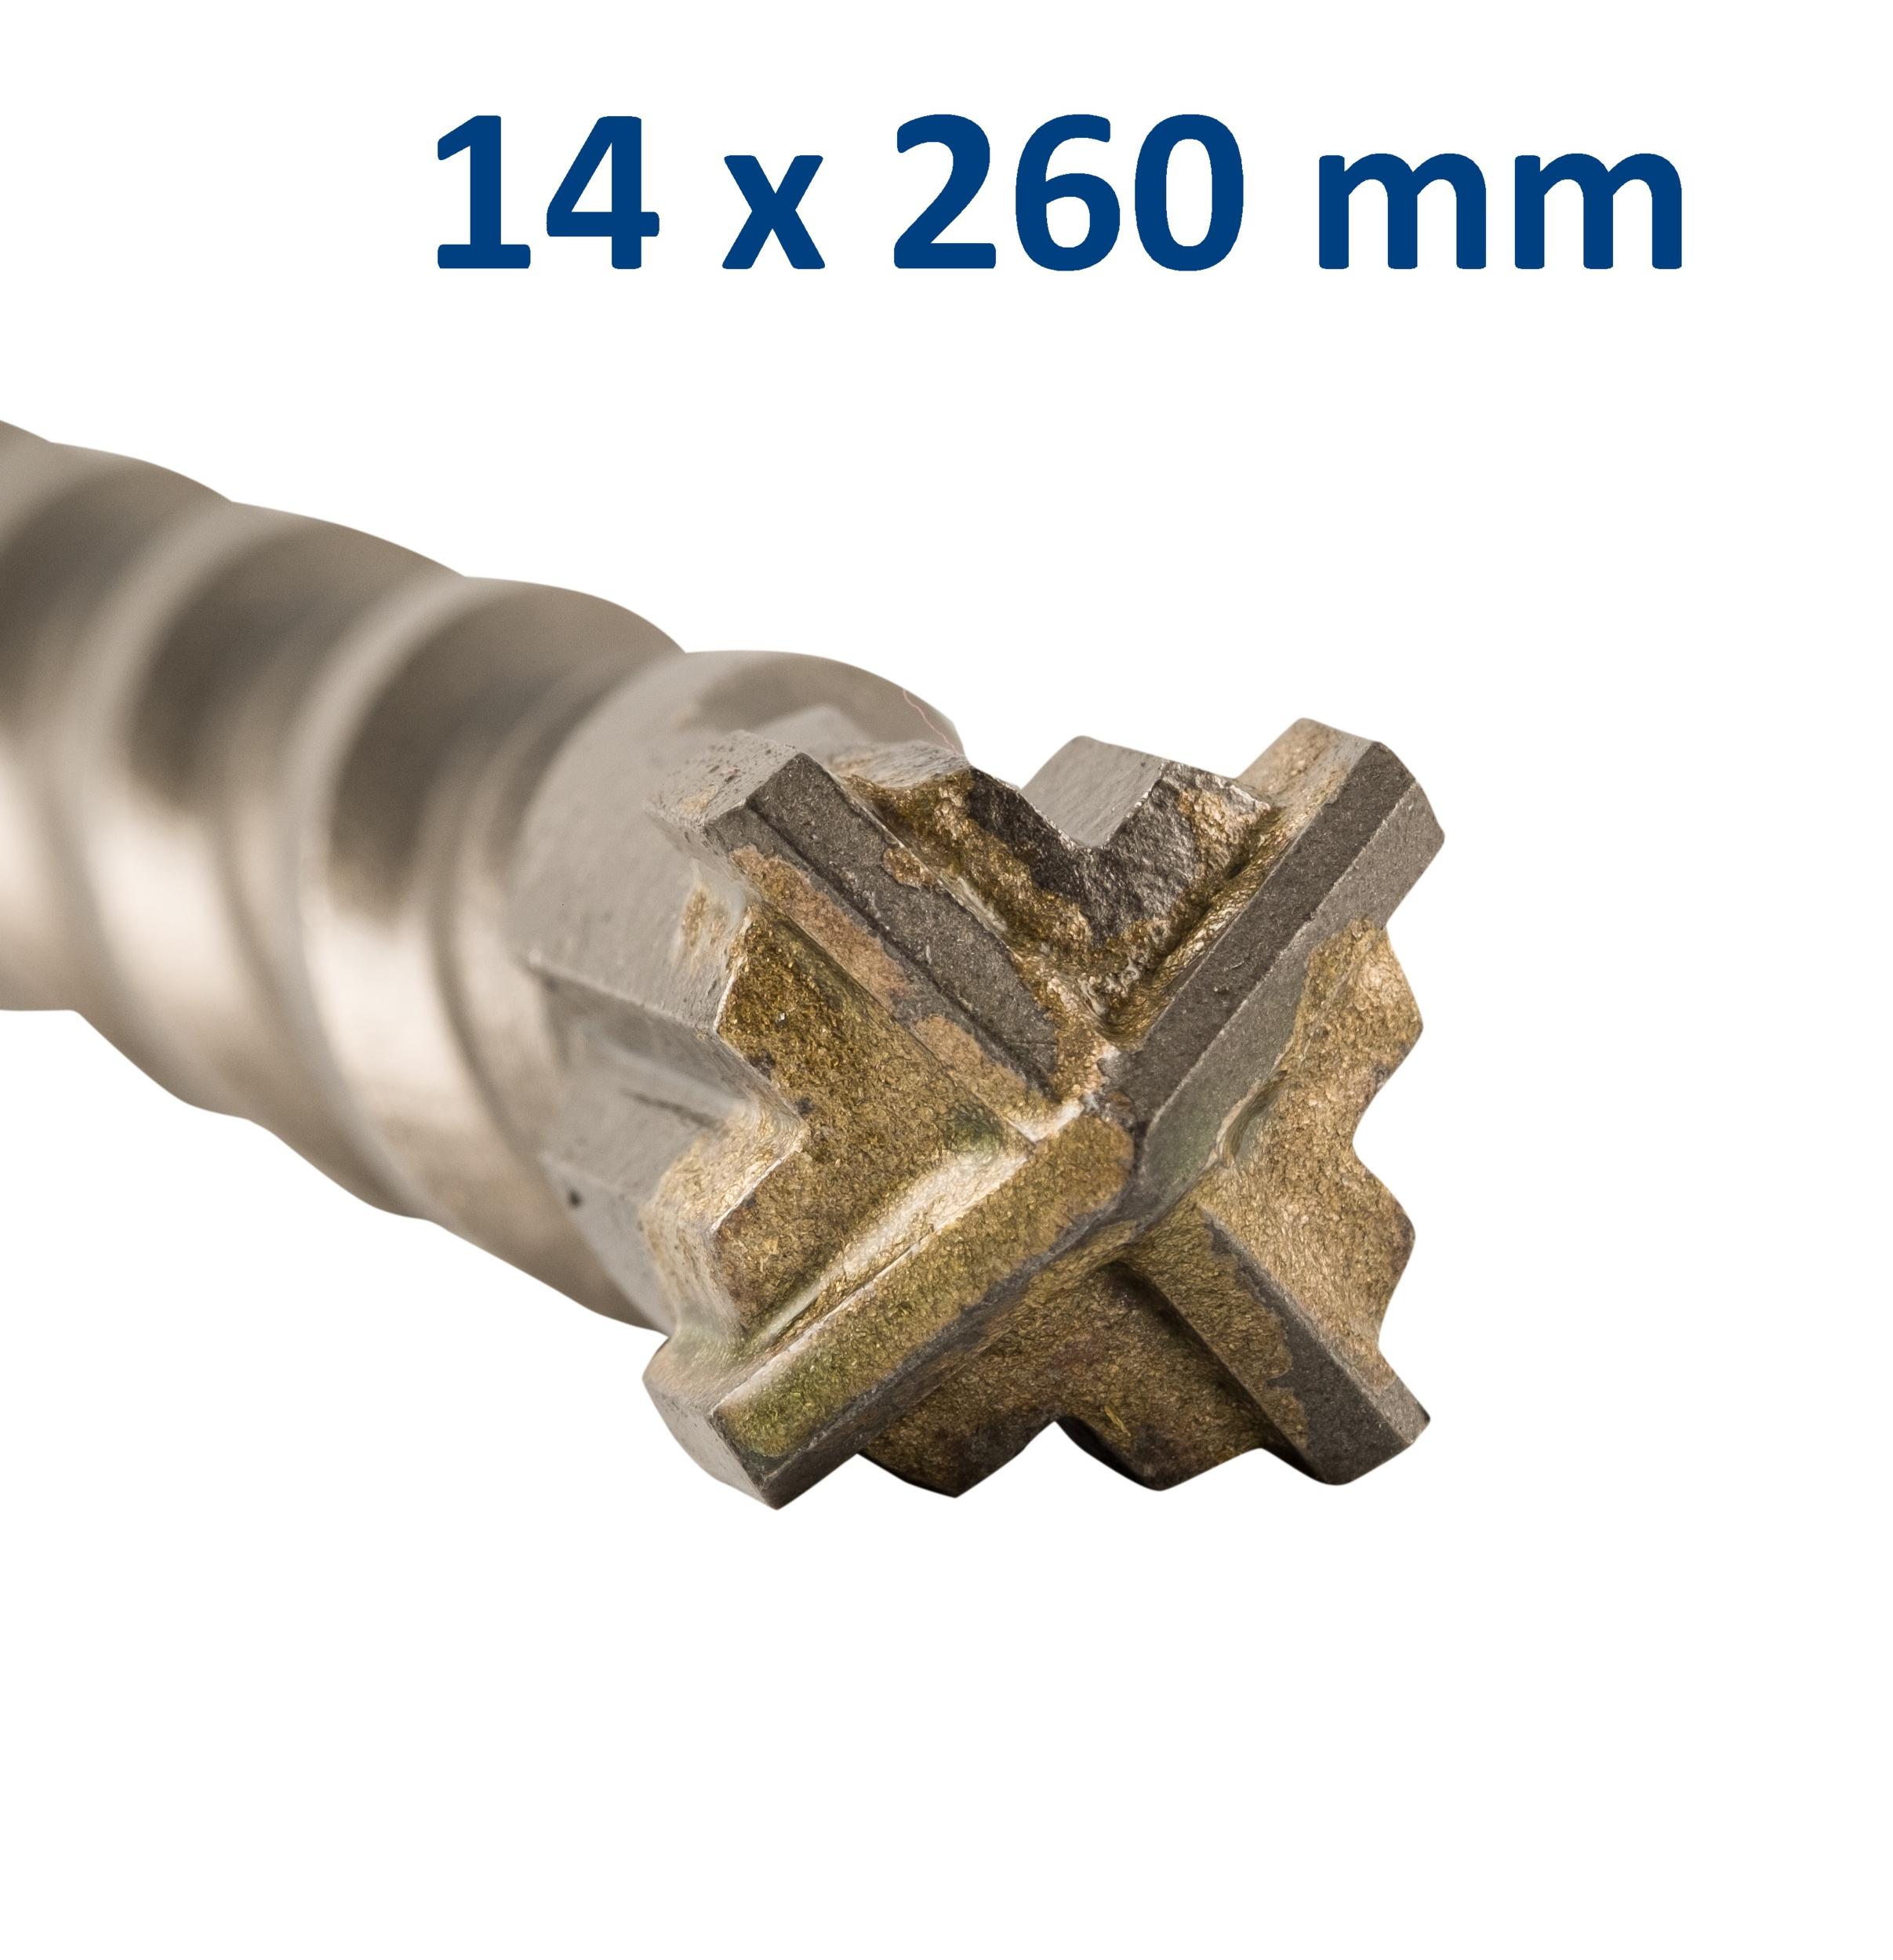 K2204-614260 foret croix 14x260mm 2